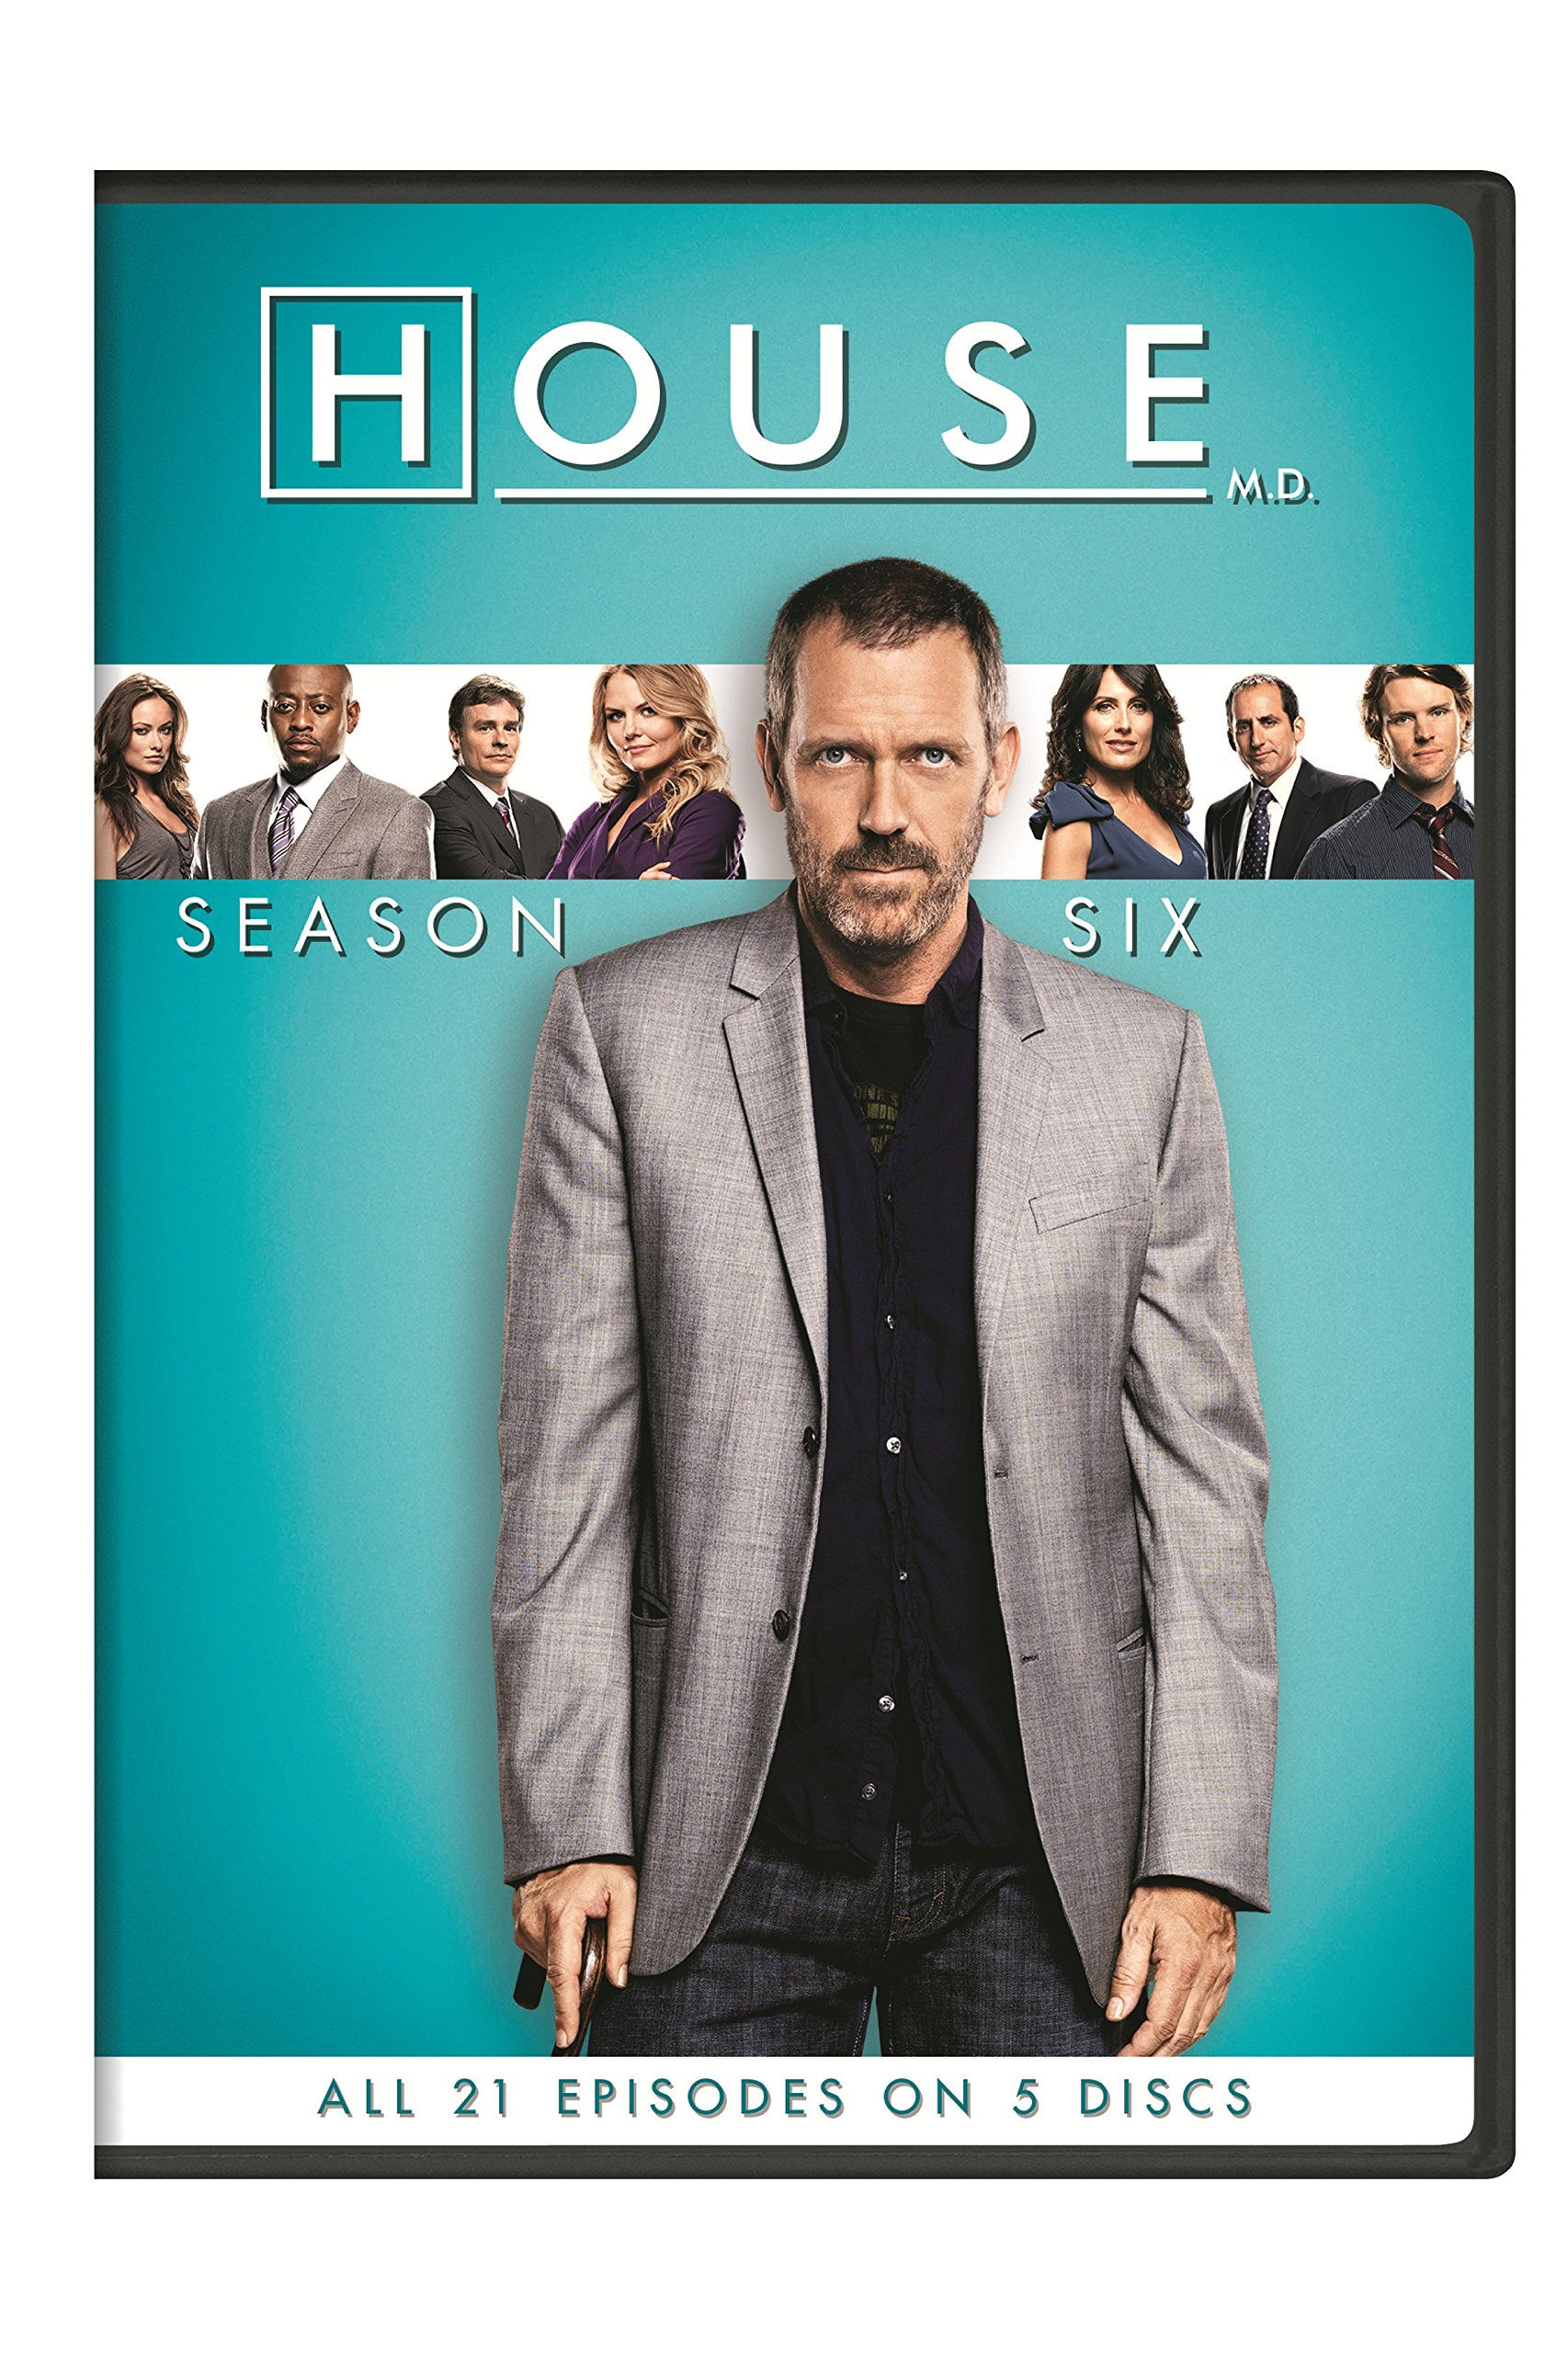 DVD : House: Season Six (Boxed Set, Snap Case, 5 Disc)